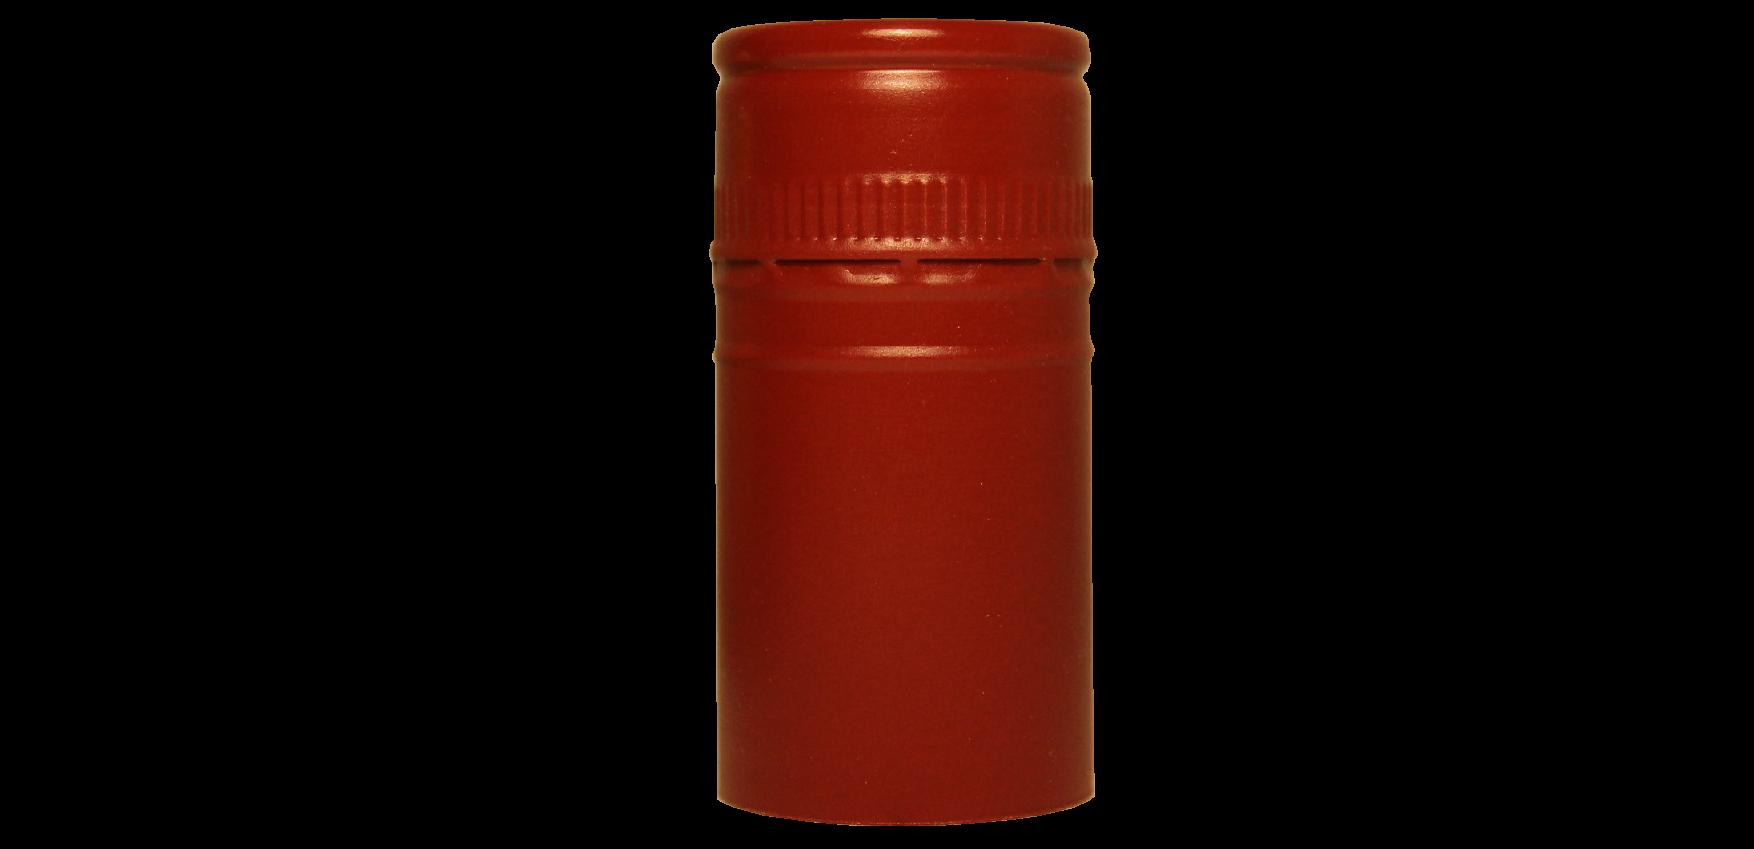 Capsule rouge